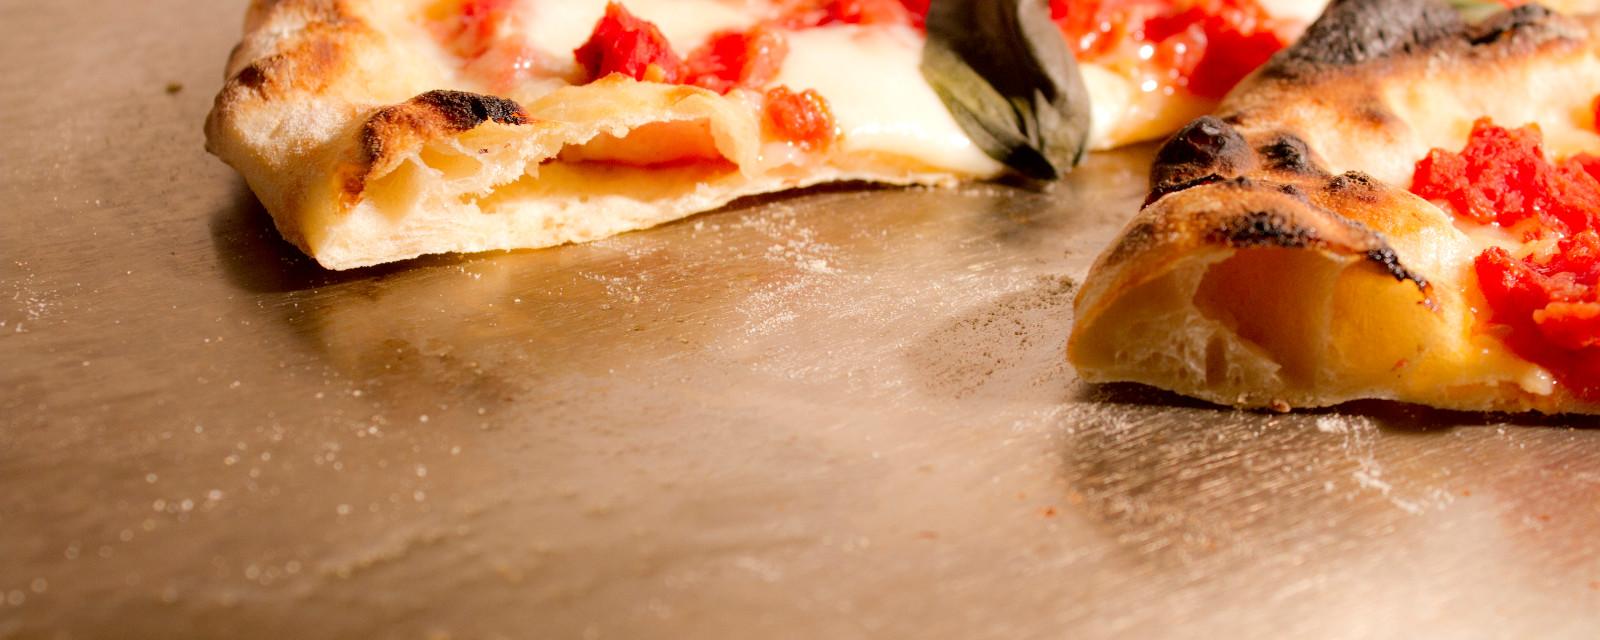 Pizza napolitana con plancha de acero